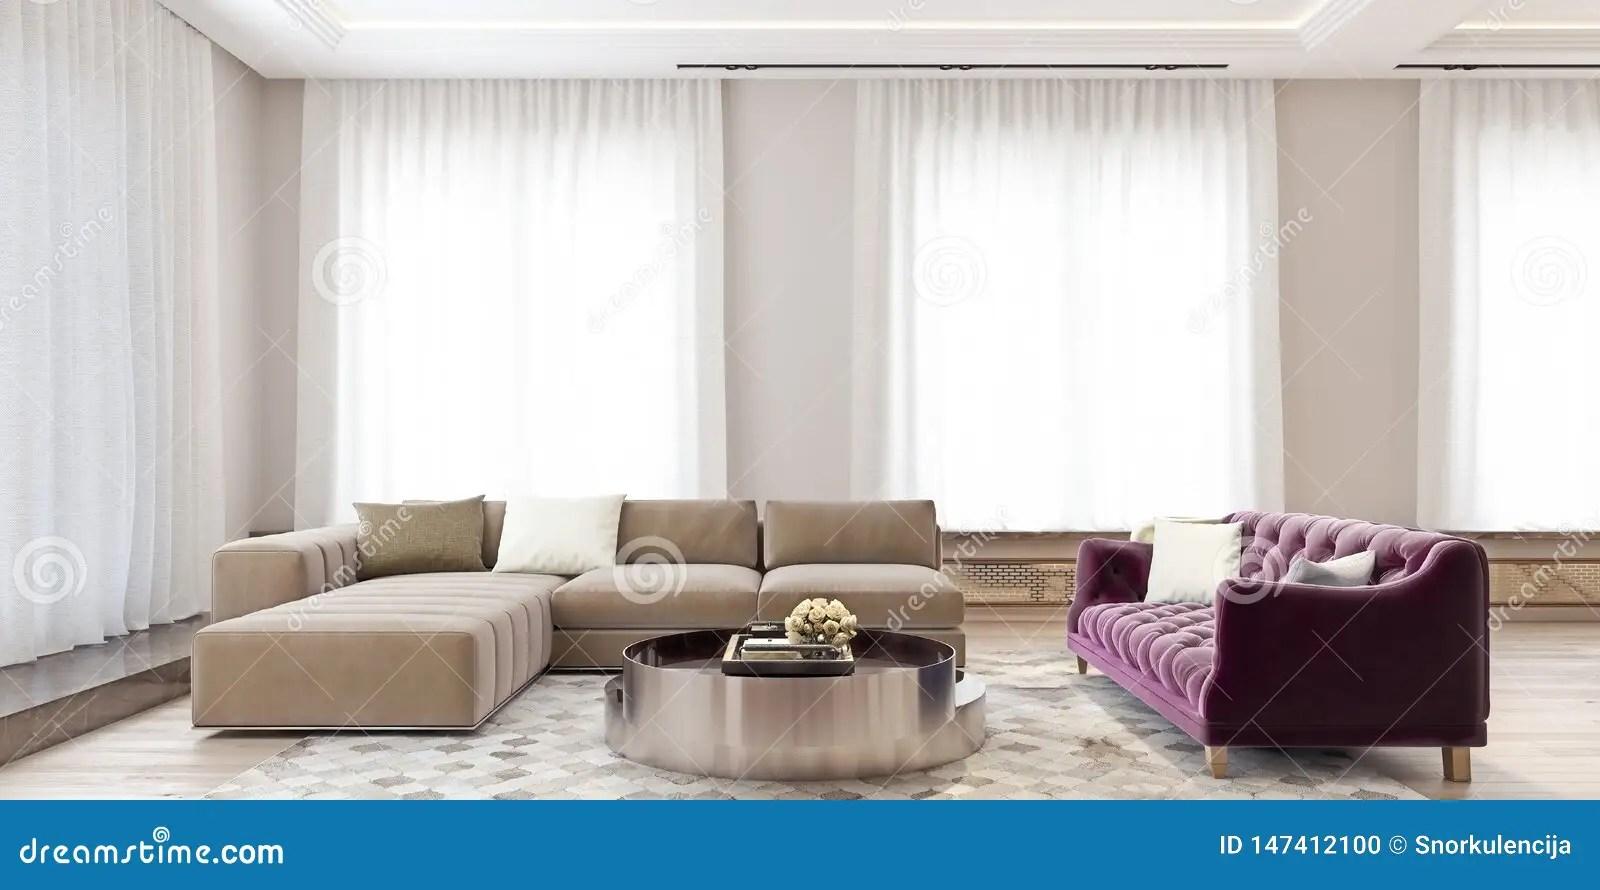 Modern Interior Design Of A Big Living Room With Angled Sofa